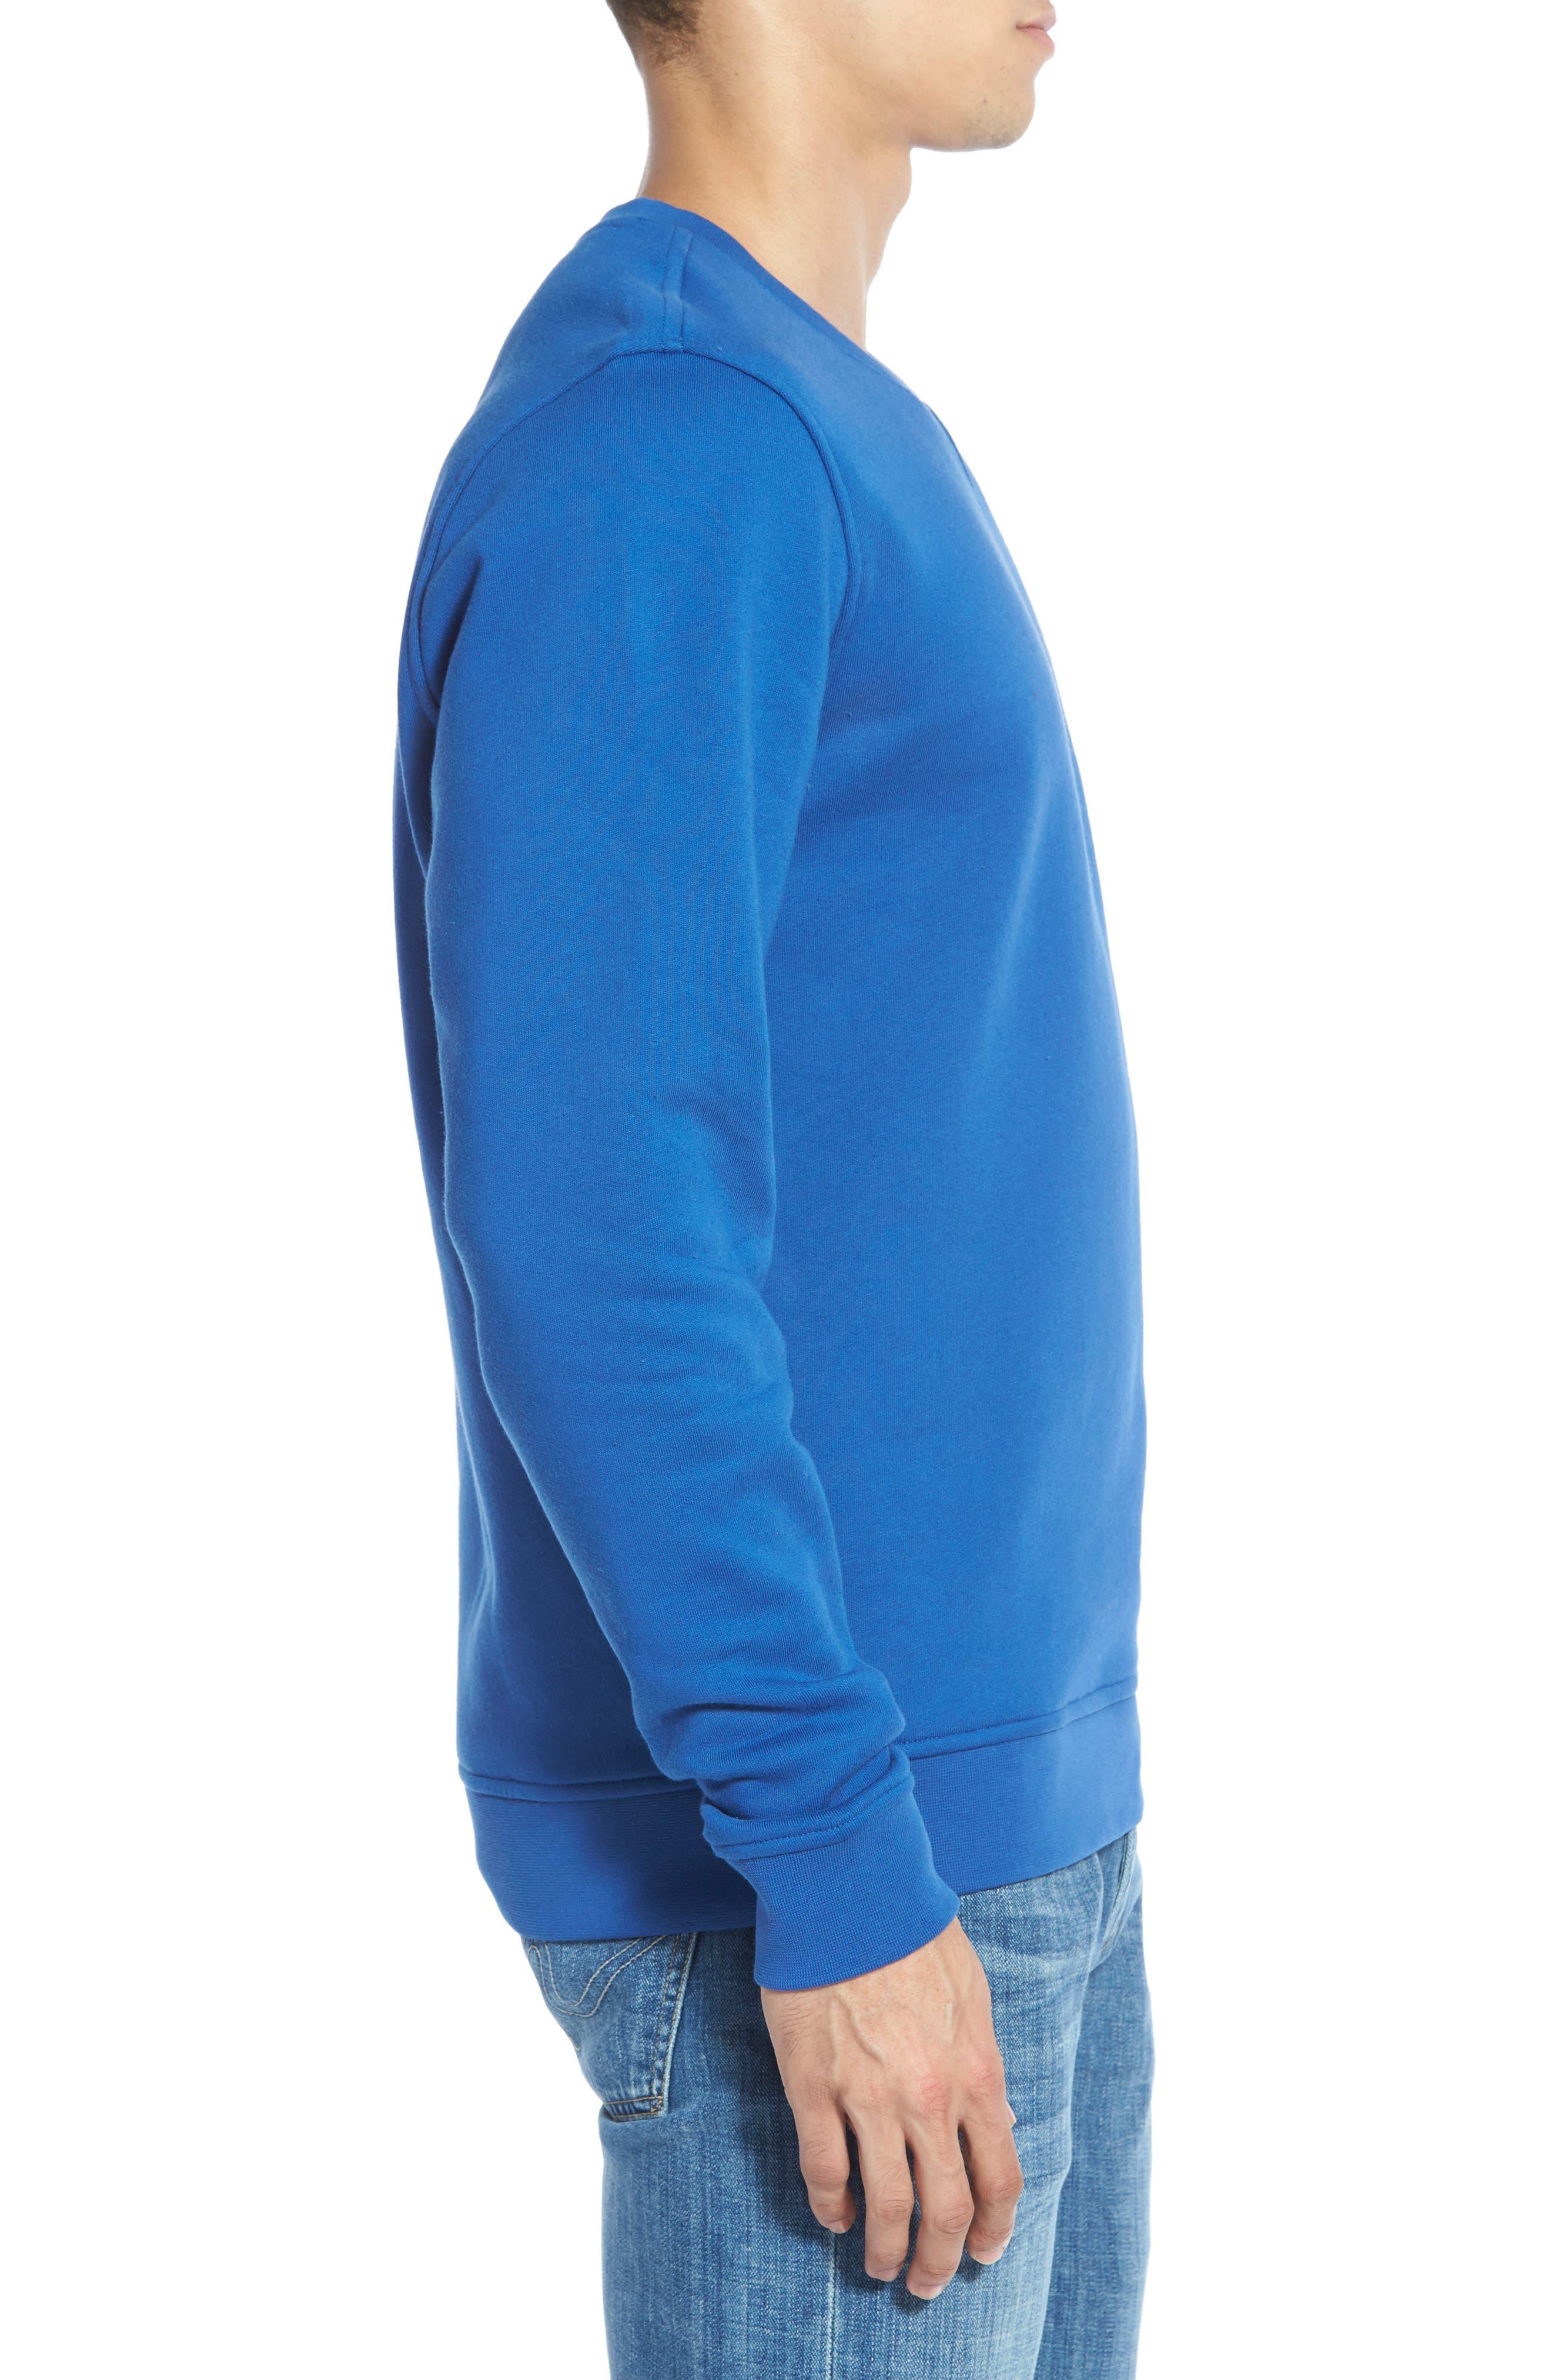 LACOSTE, 'Sport' Crewneck Sweatshirt, Alternate thumbnail 3, color, NAVY